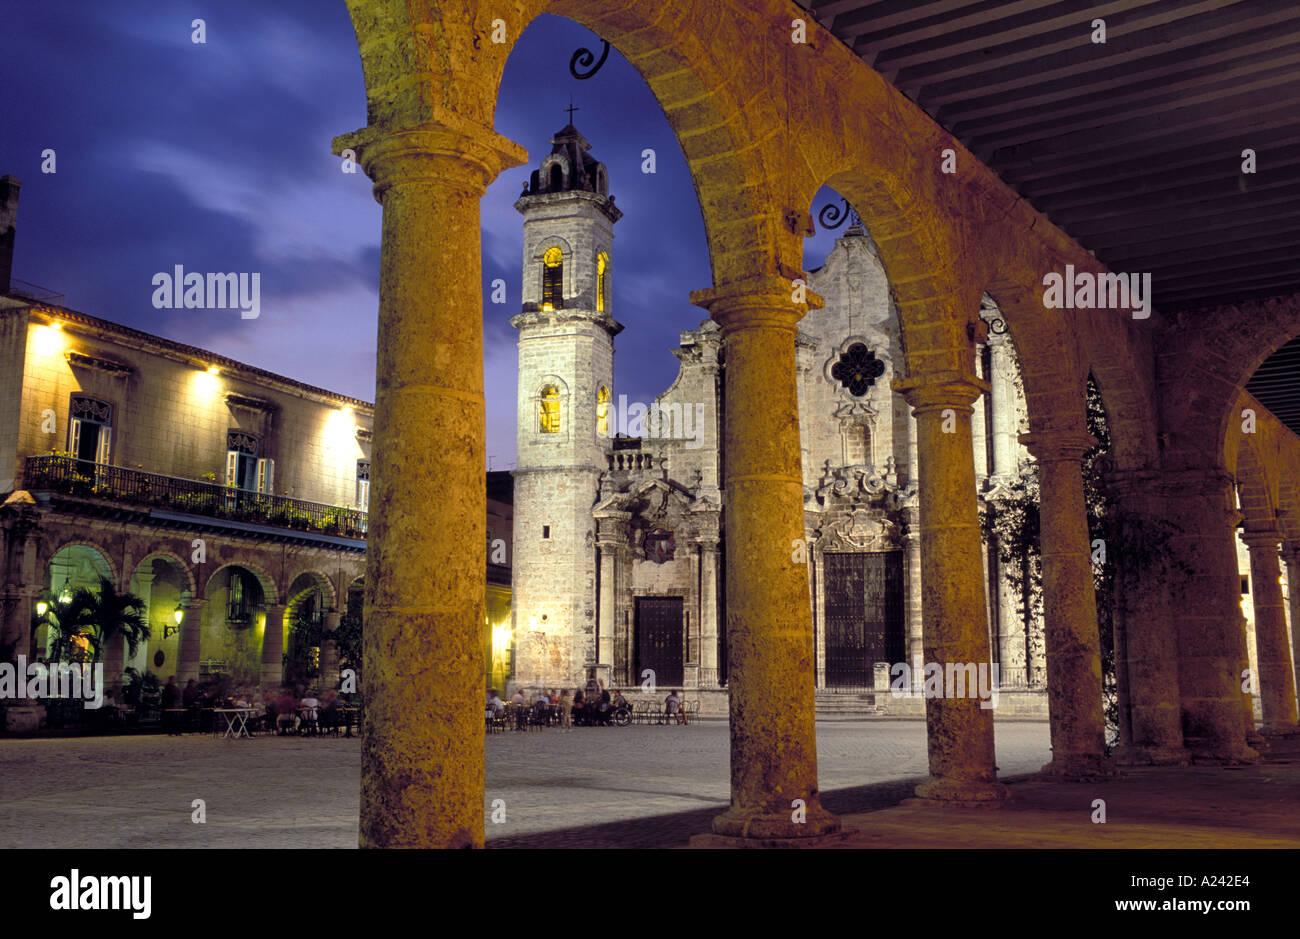 Cuba Havana Catedral de San Cristobal - Stock Image